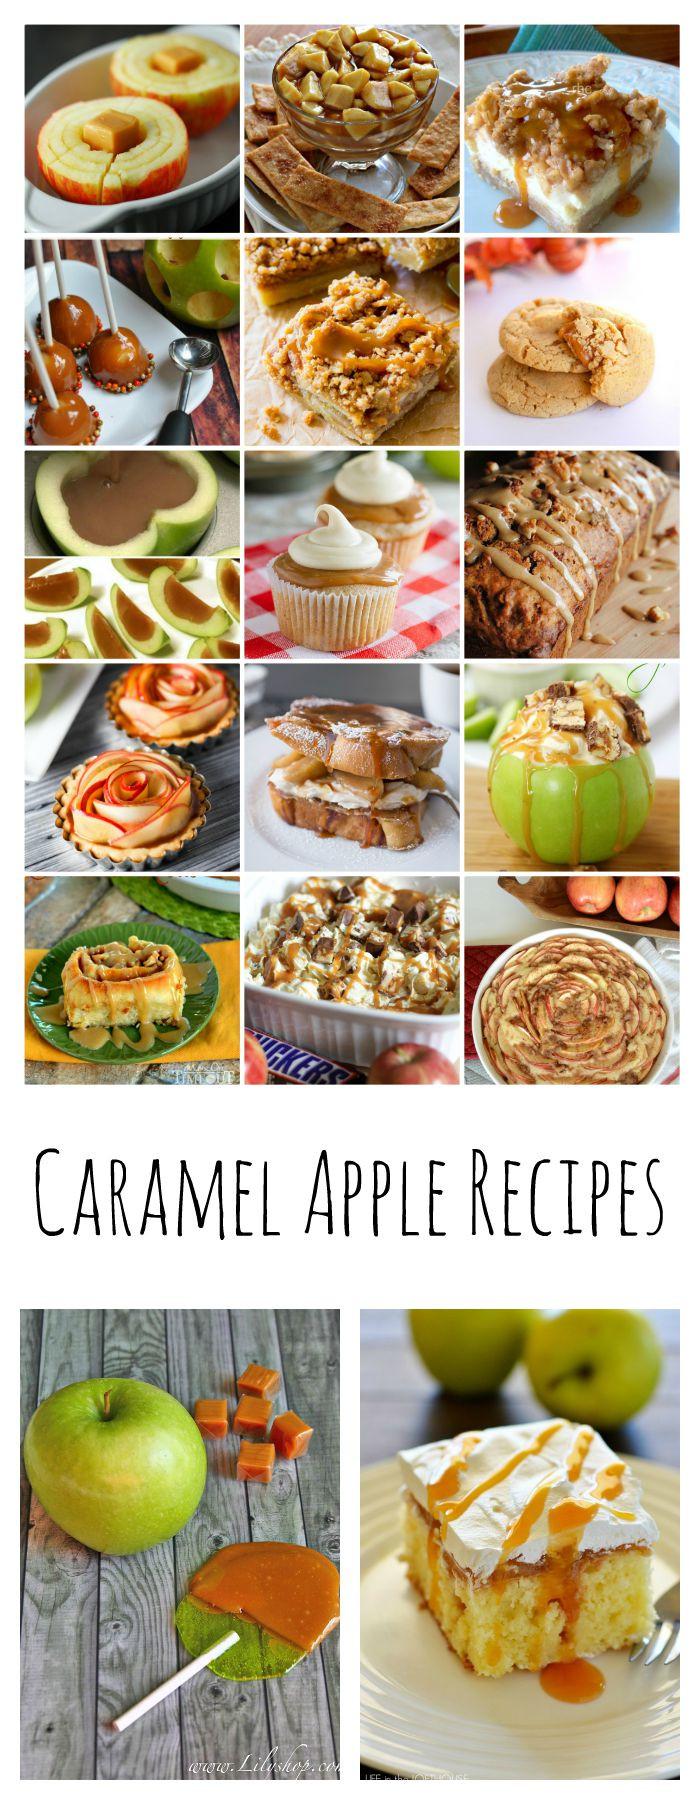 Apple Recipes For Fall  Caramel Apple Recipes The Idea Room